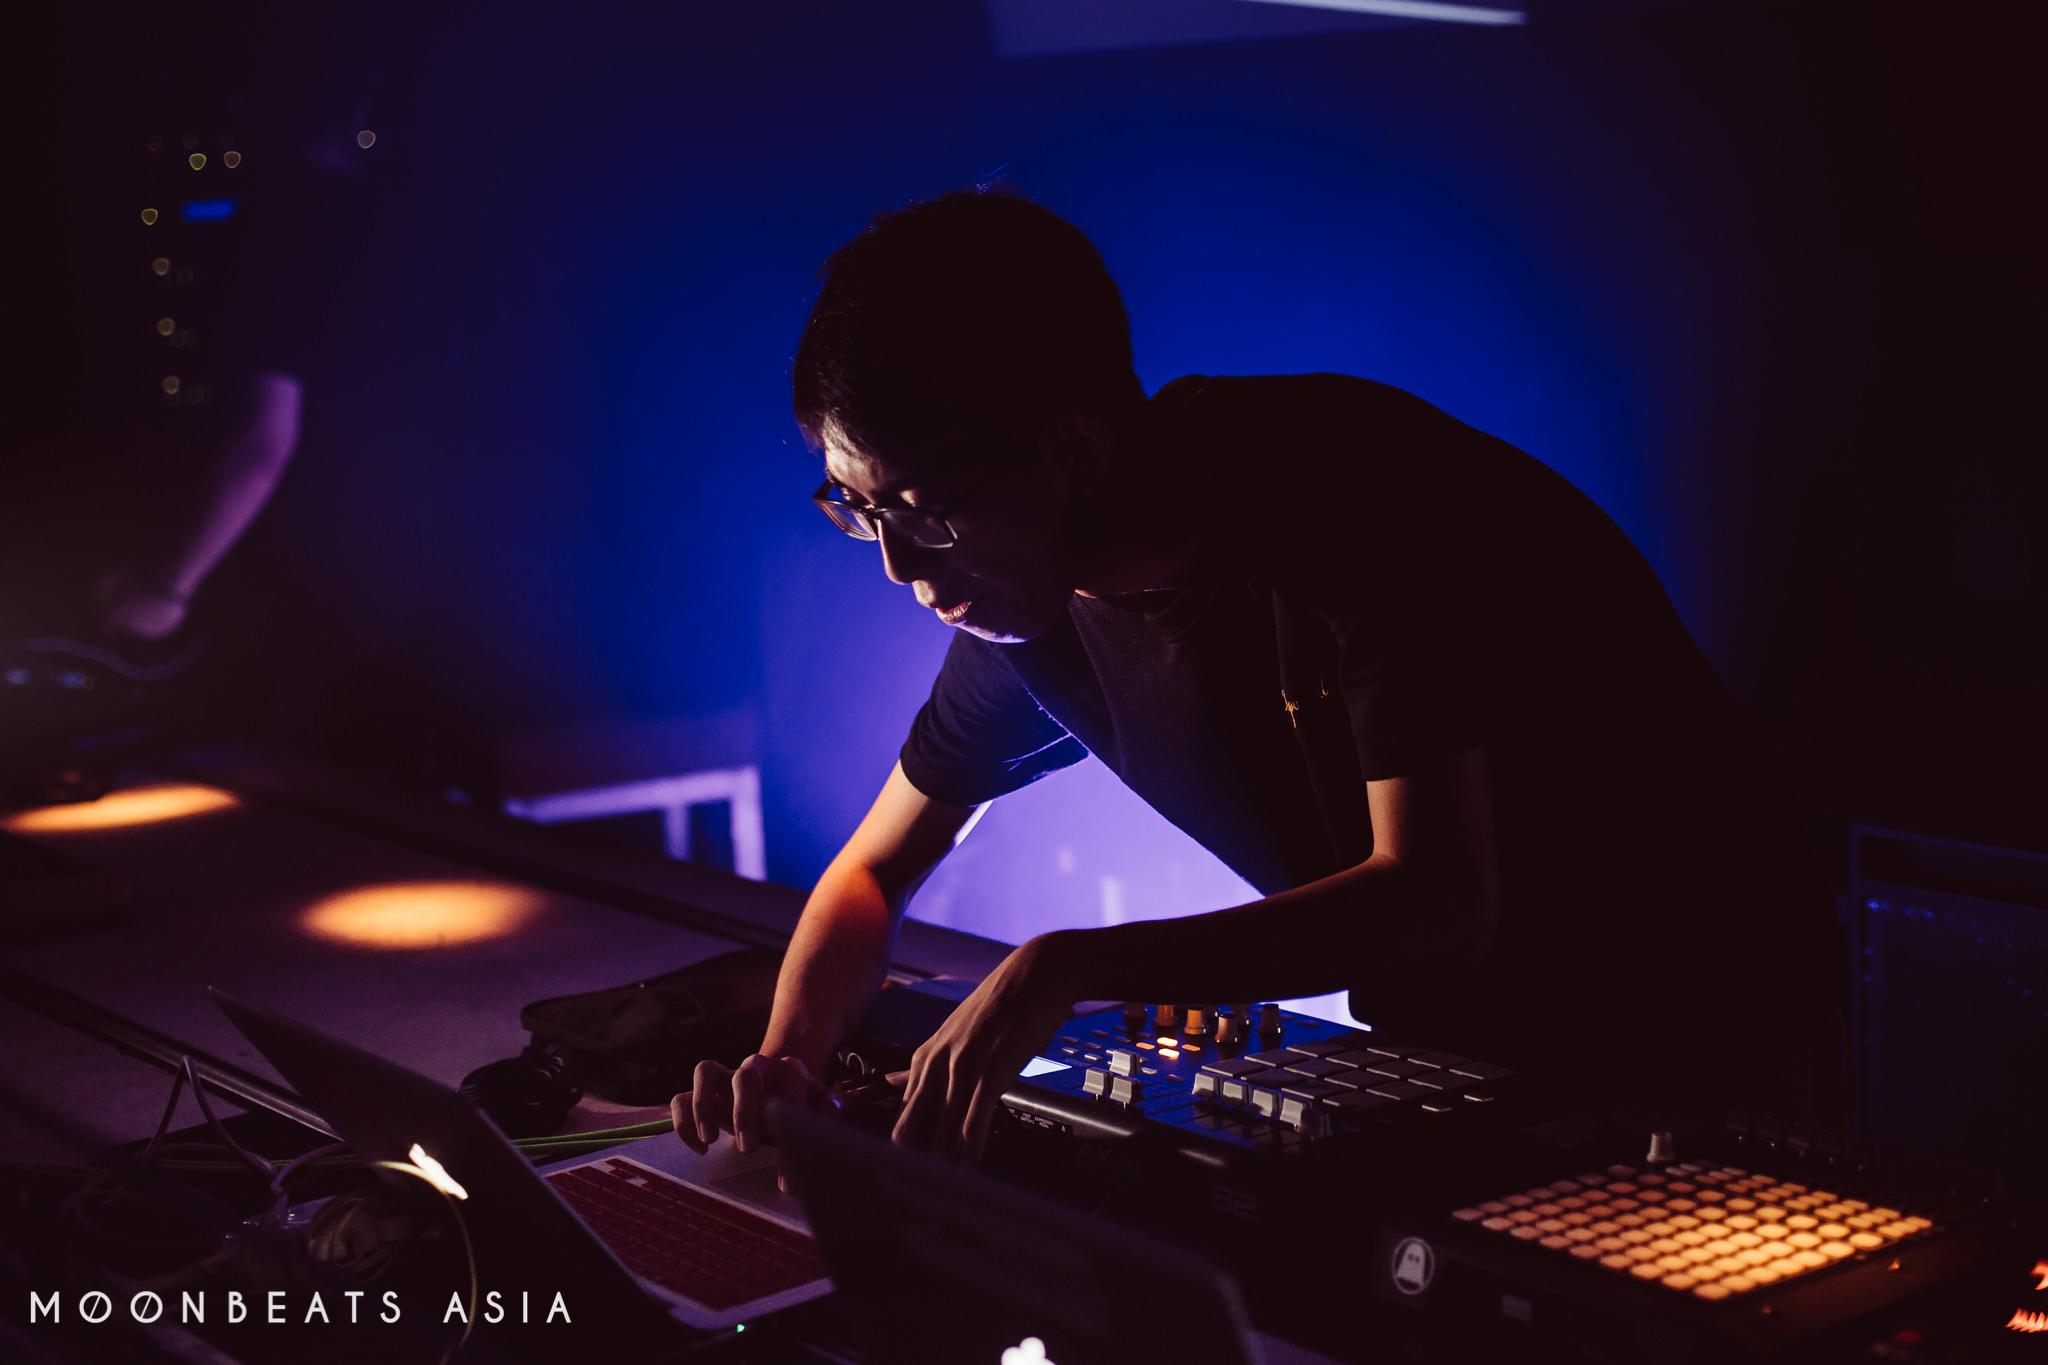 Fzpz at Kyo, Singapore